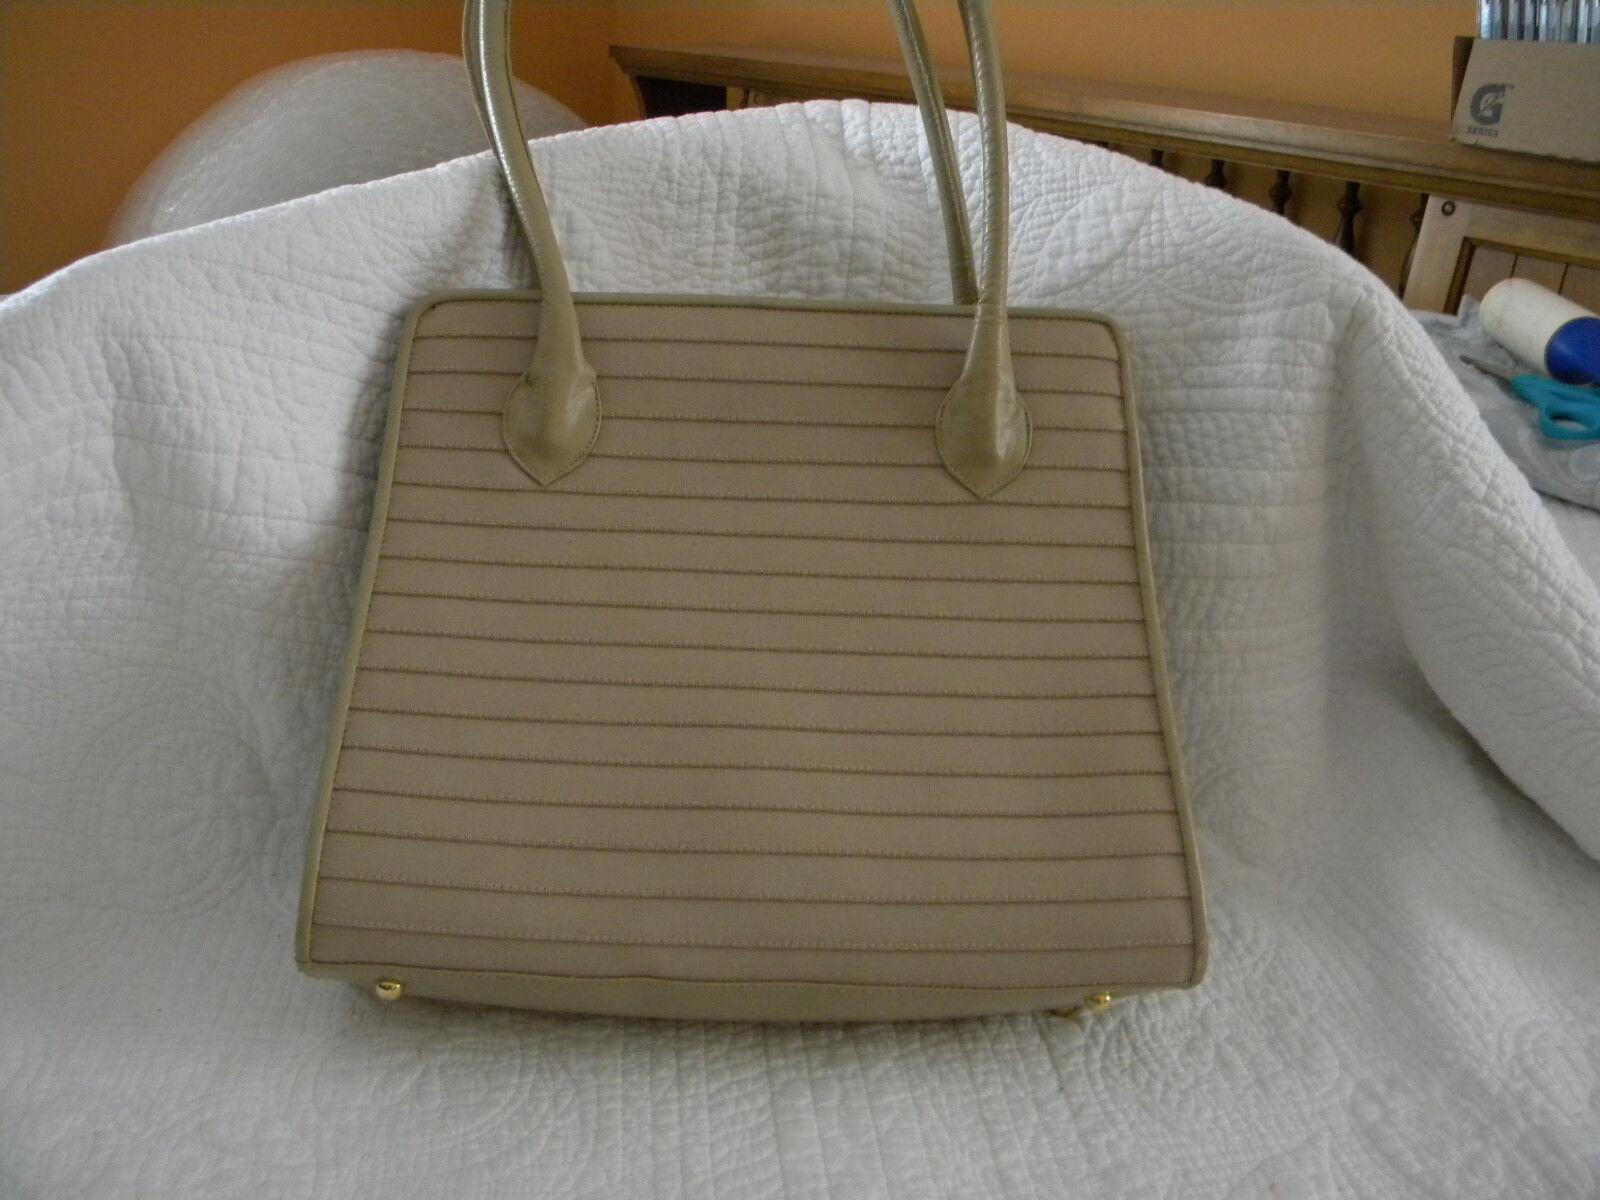 Stuart Weitzman Taupe Leather:Plastic/Calf Handbag in EXCELLENT CONDITION